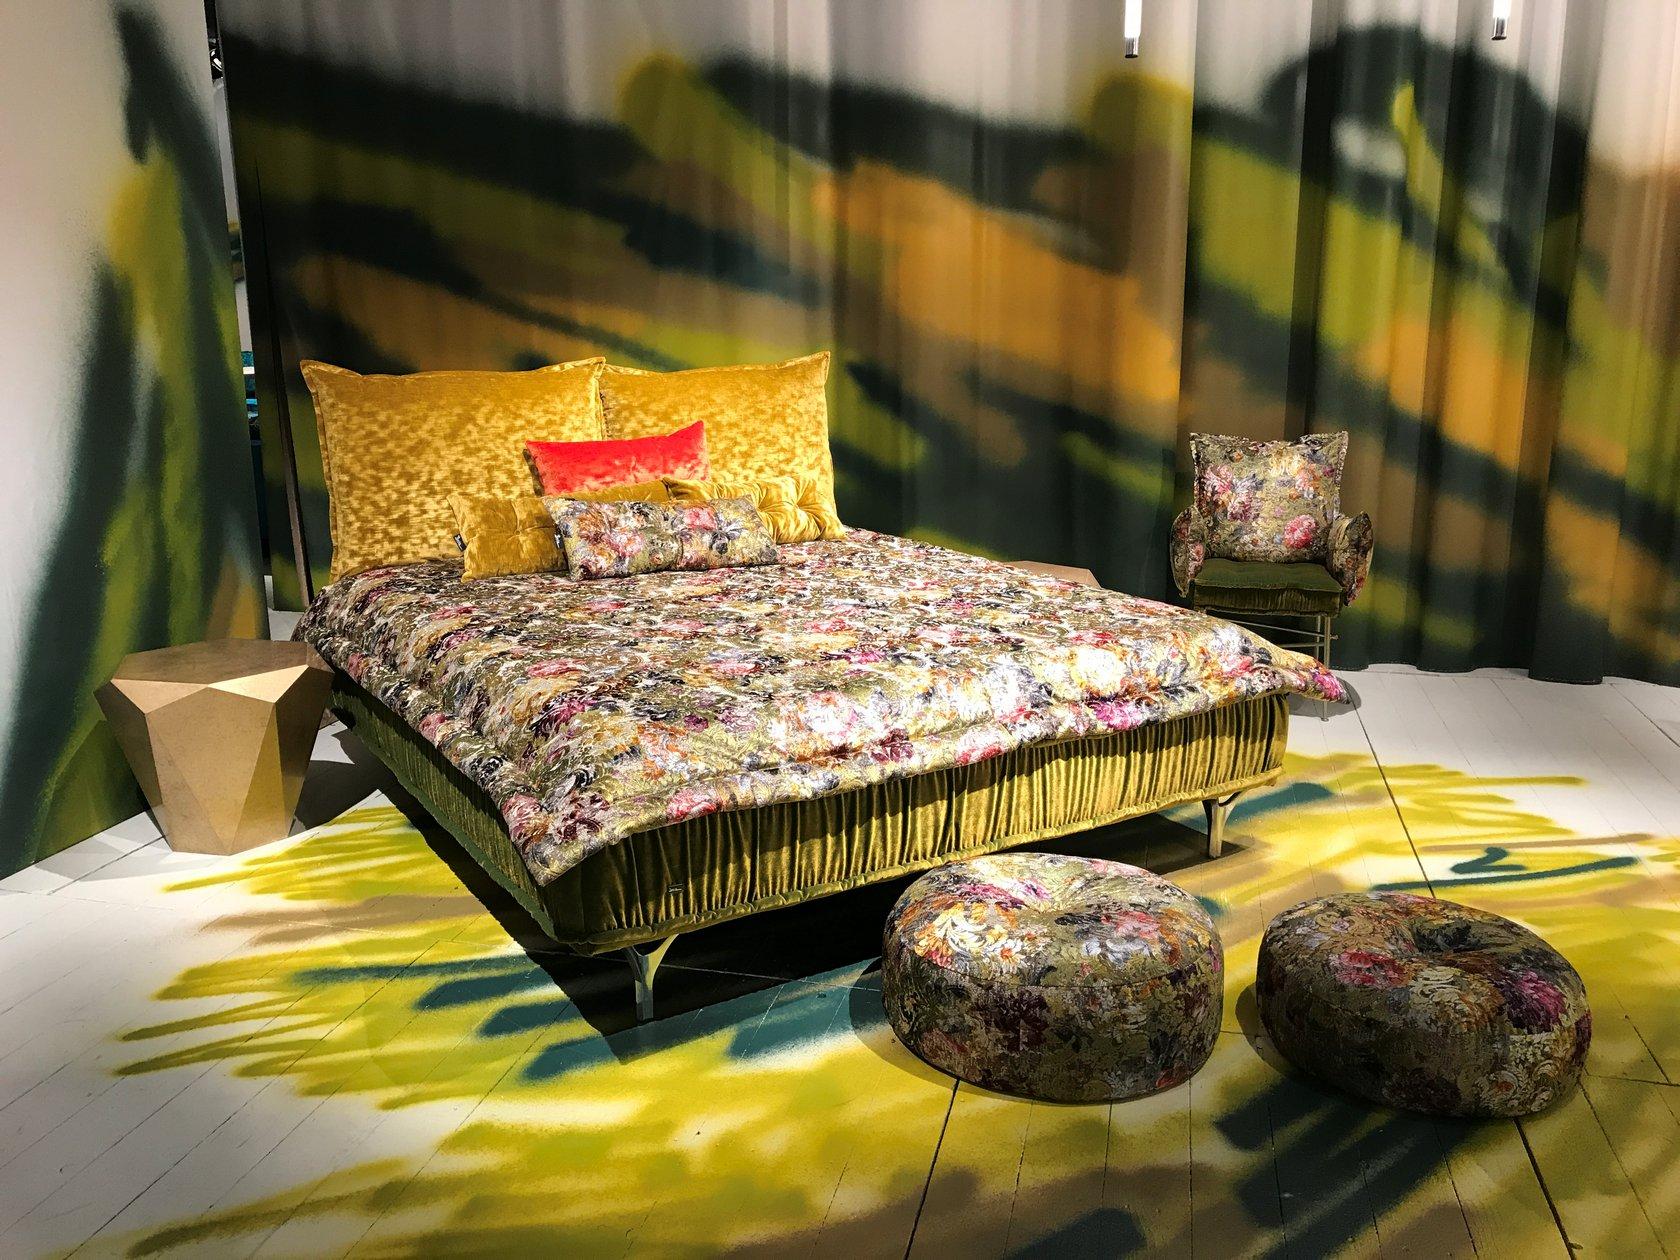 bretz imm2018 koeln moebelmesse 09 bretz. Black Bedroom Furniture Sets. Home Design Ideas